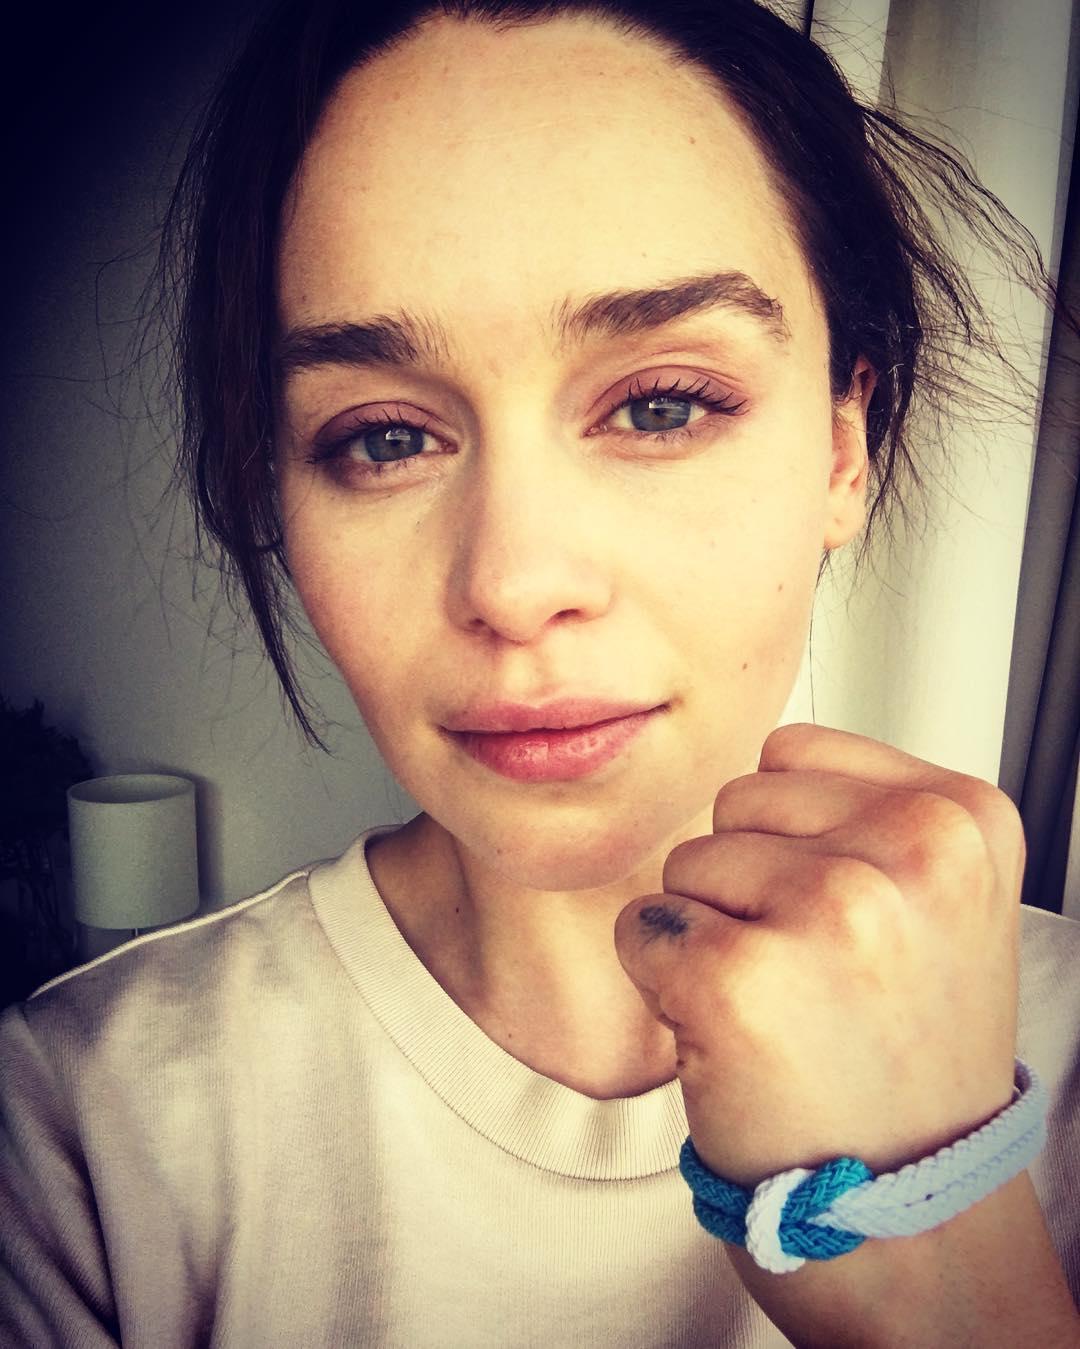 Emilia Clarke Instagram username